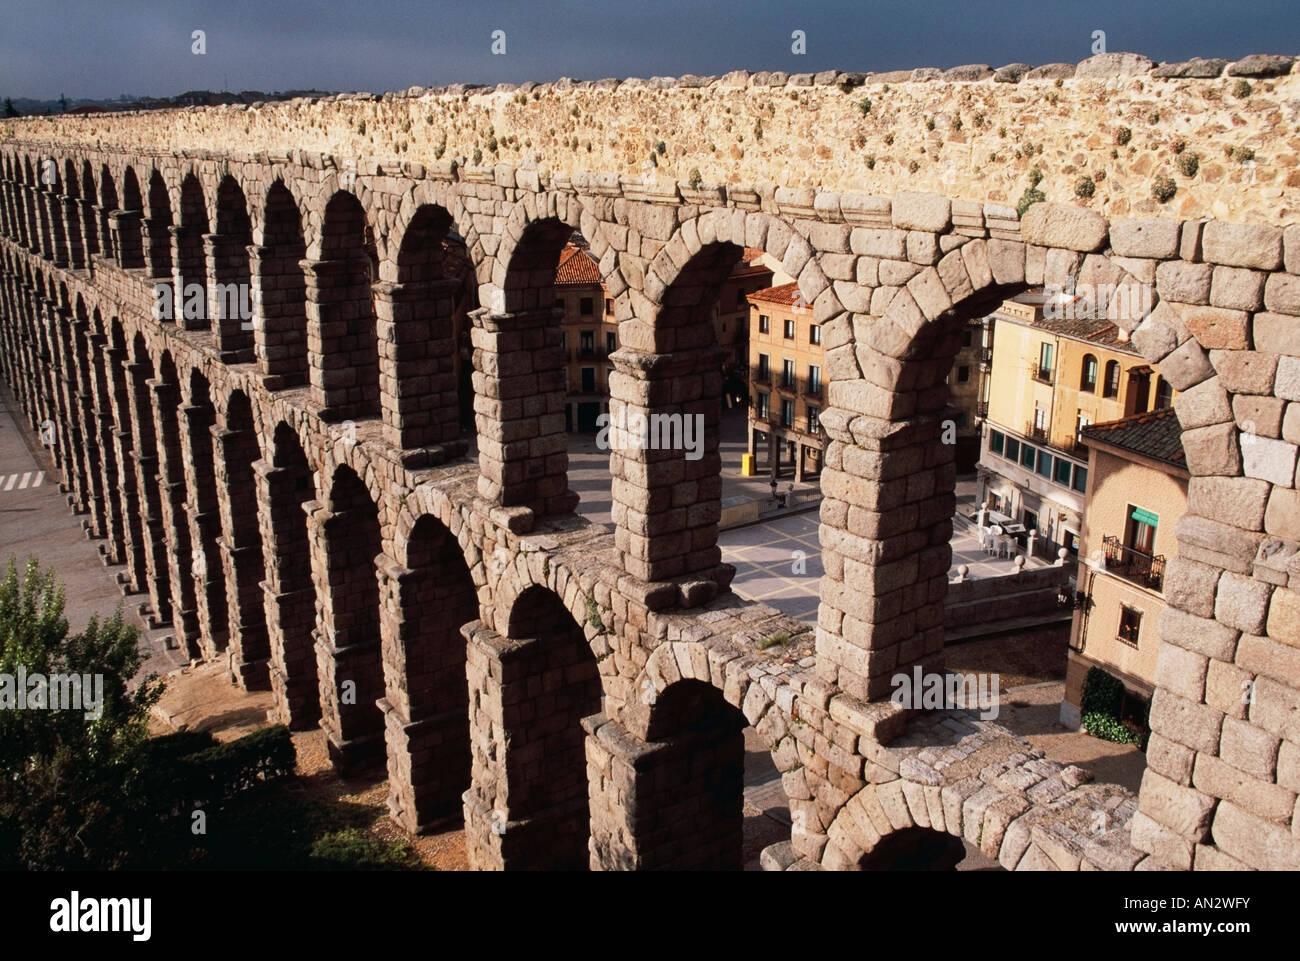 Roman Aqueduct, Segovia, Castile and Leon, Spain Stock Photo